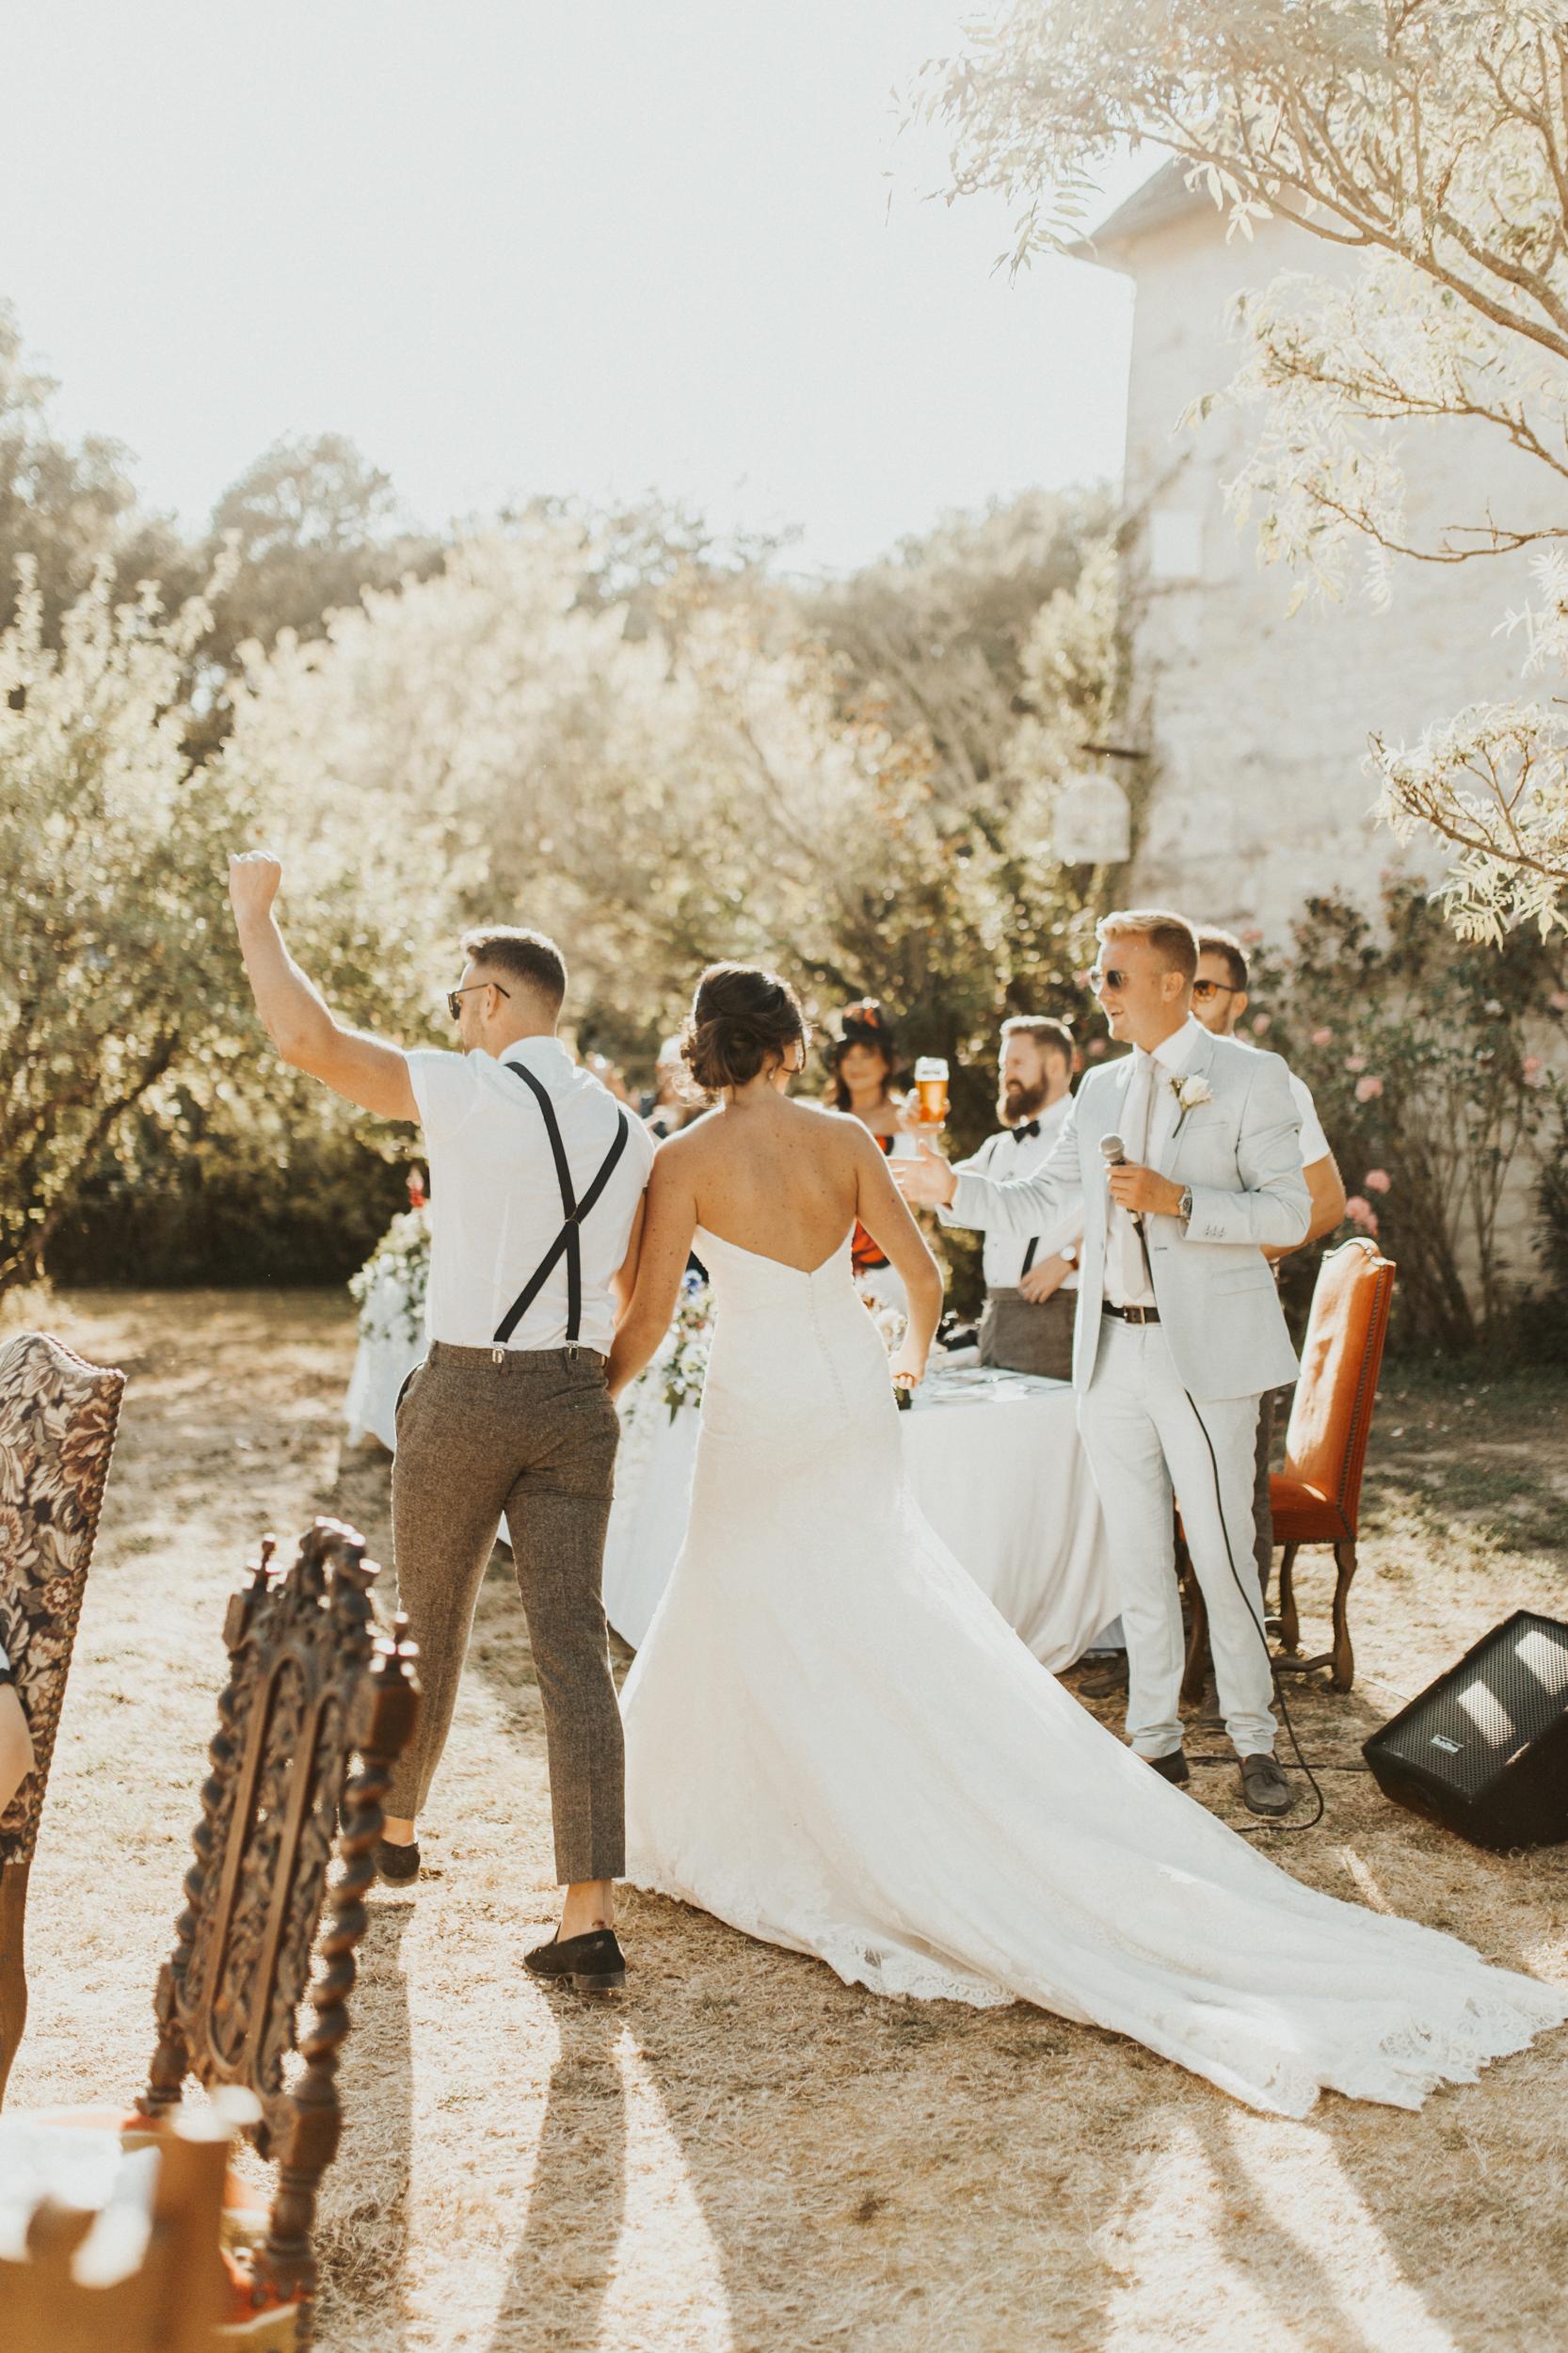 Amy-Zac-Destination-Wedding-France-Manoir-Foulquetiere-Darina-Stoda-Photography-76.jpg